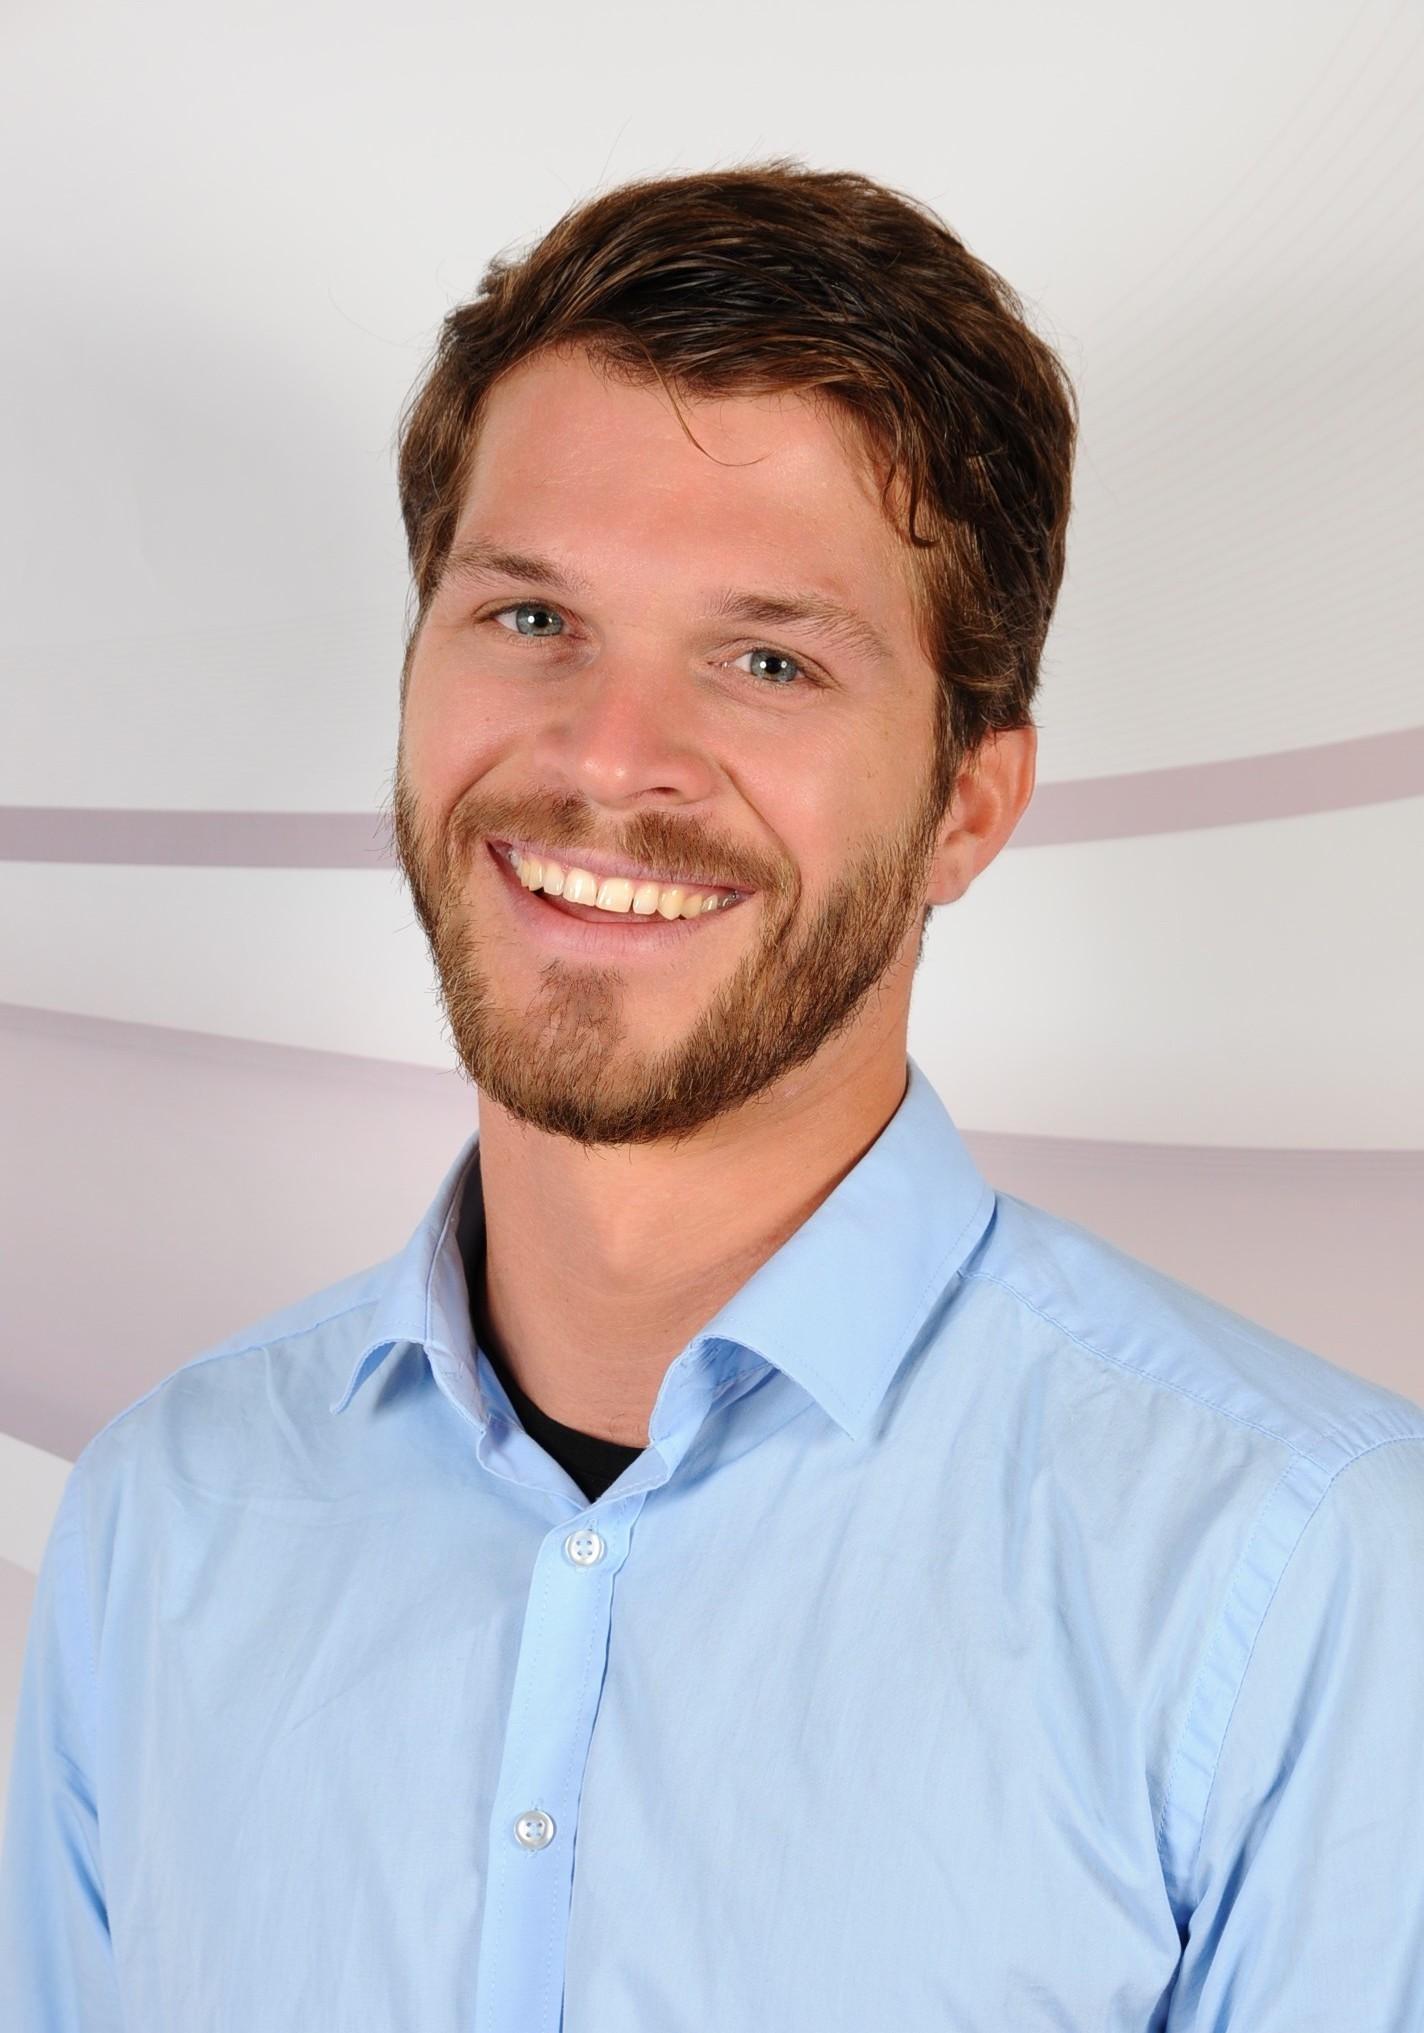 DI Dr. Markus Buchetics-Eibelwimmer : Erzieher